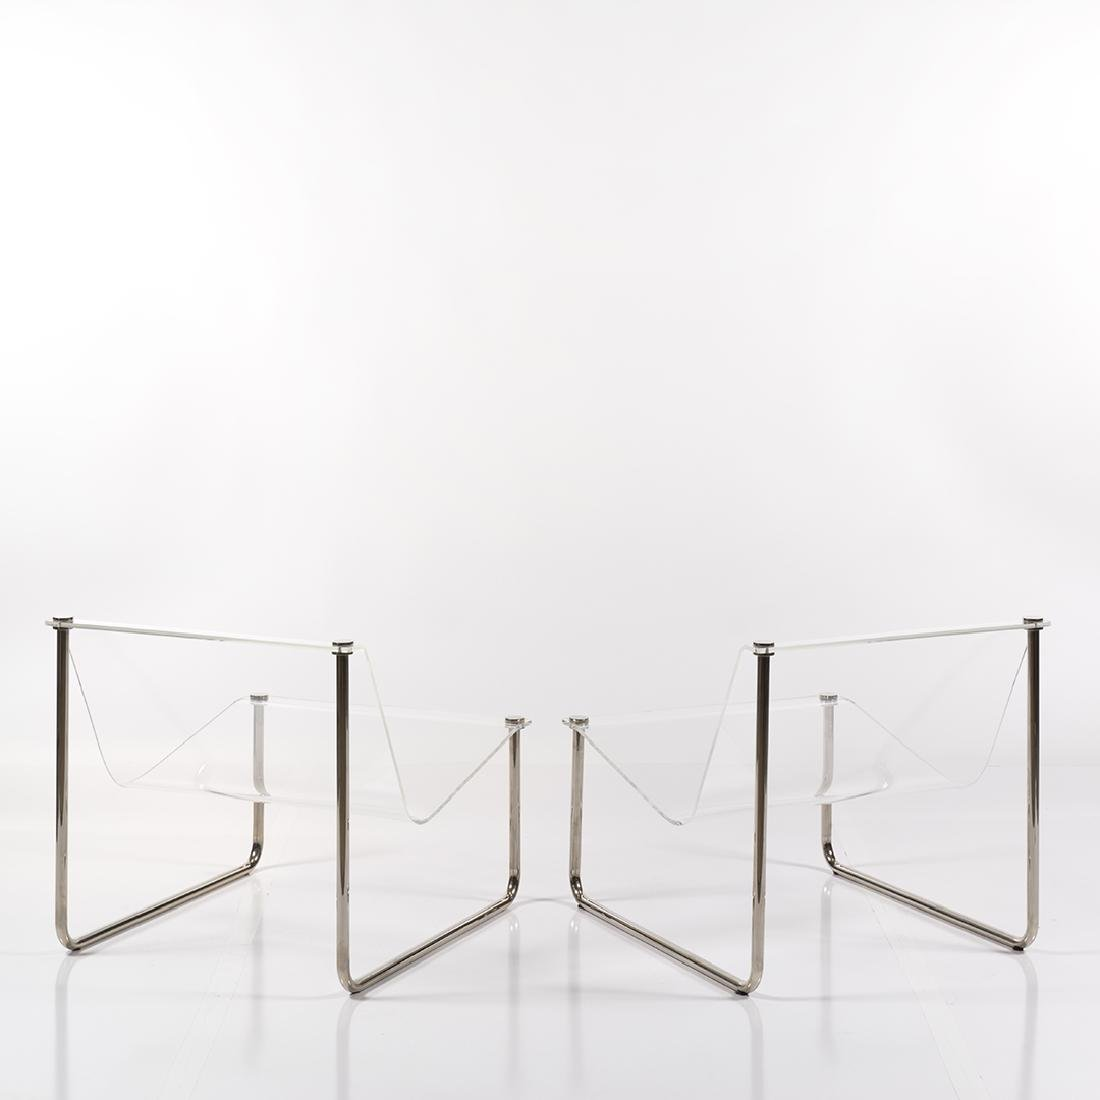 Charles Hollis Jones Sling chairs (2) - 3